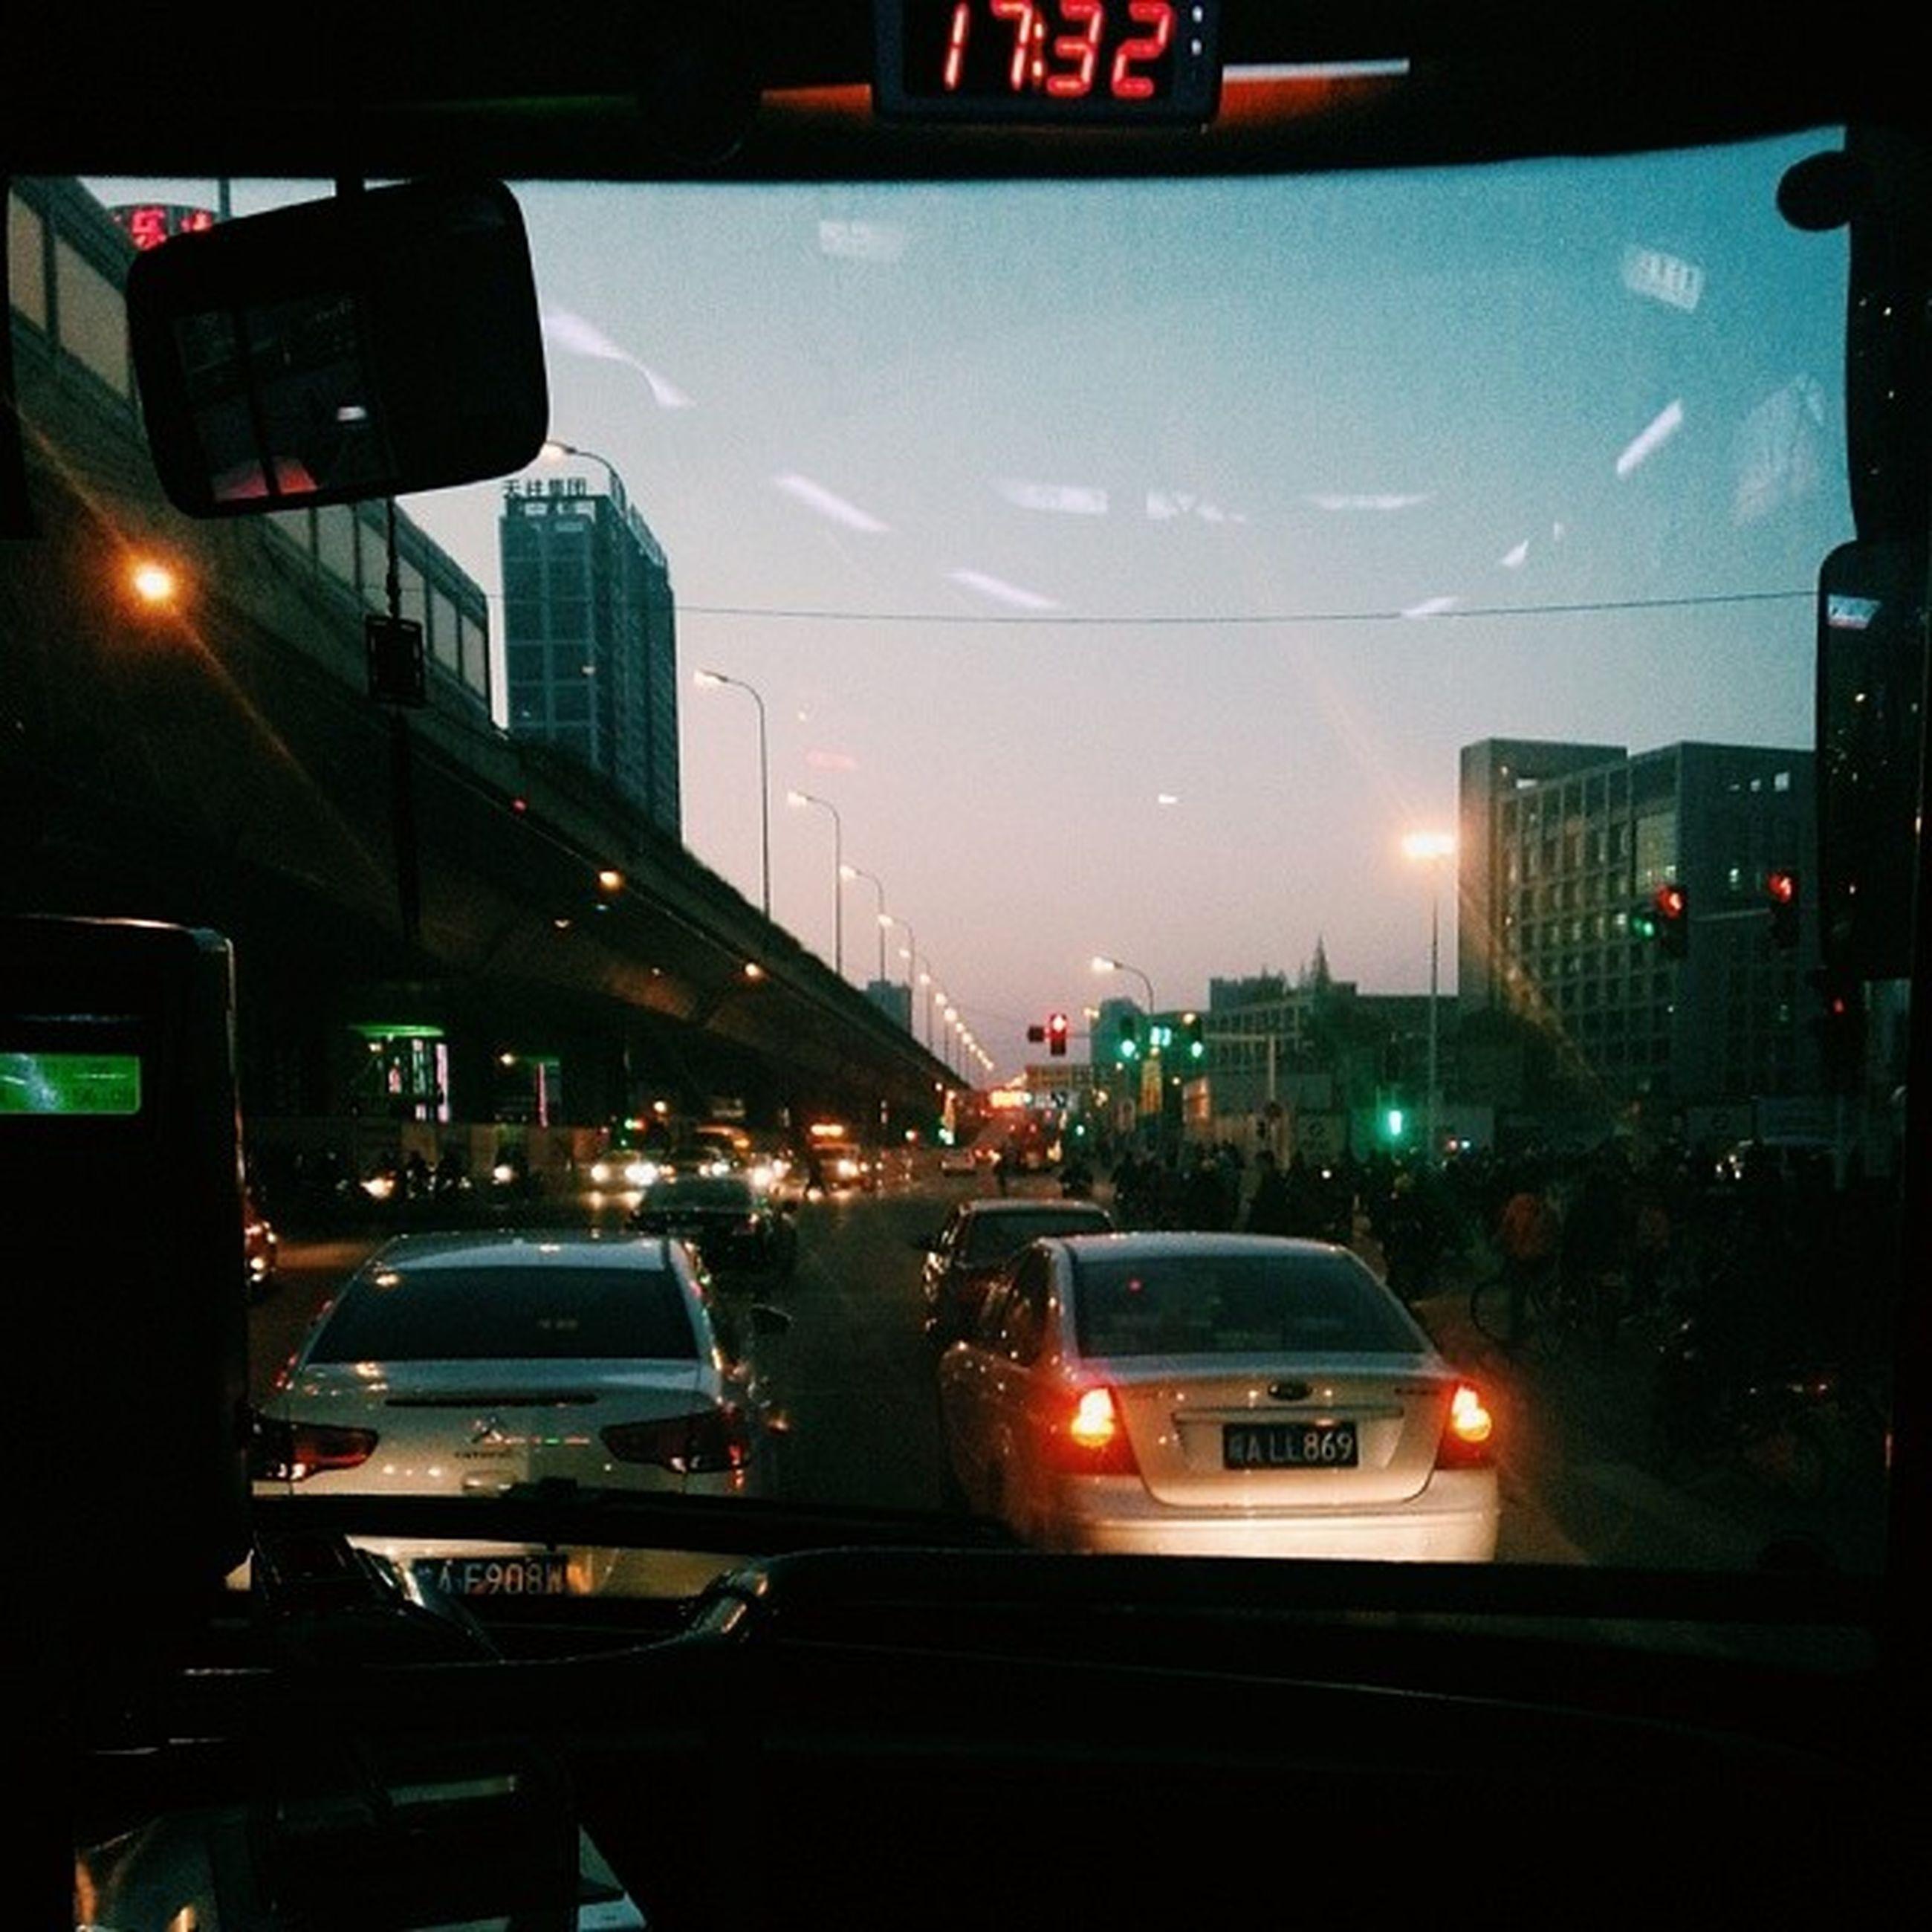 transportation, illuminated, car, land vehicle, mode of transport, building exterior, city, architecture, night, built structure, traffic, street, sky, city street, city life, street light, on the move, road, public transportation, travel